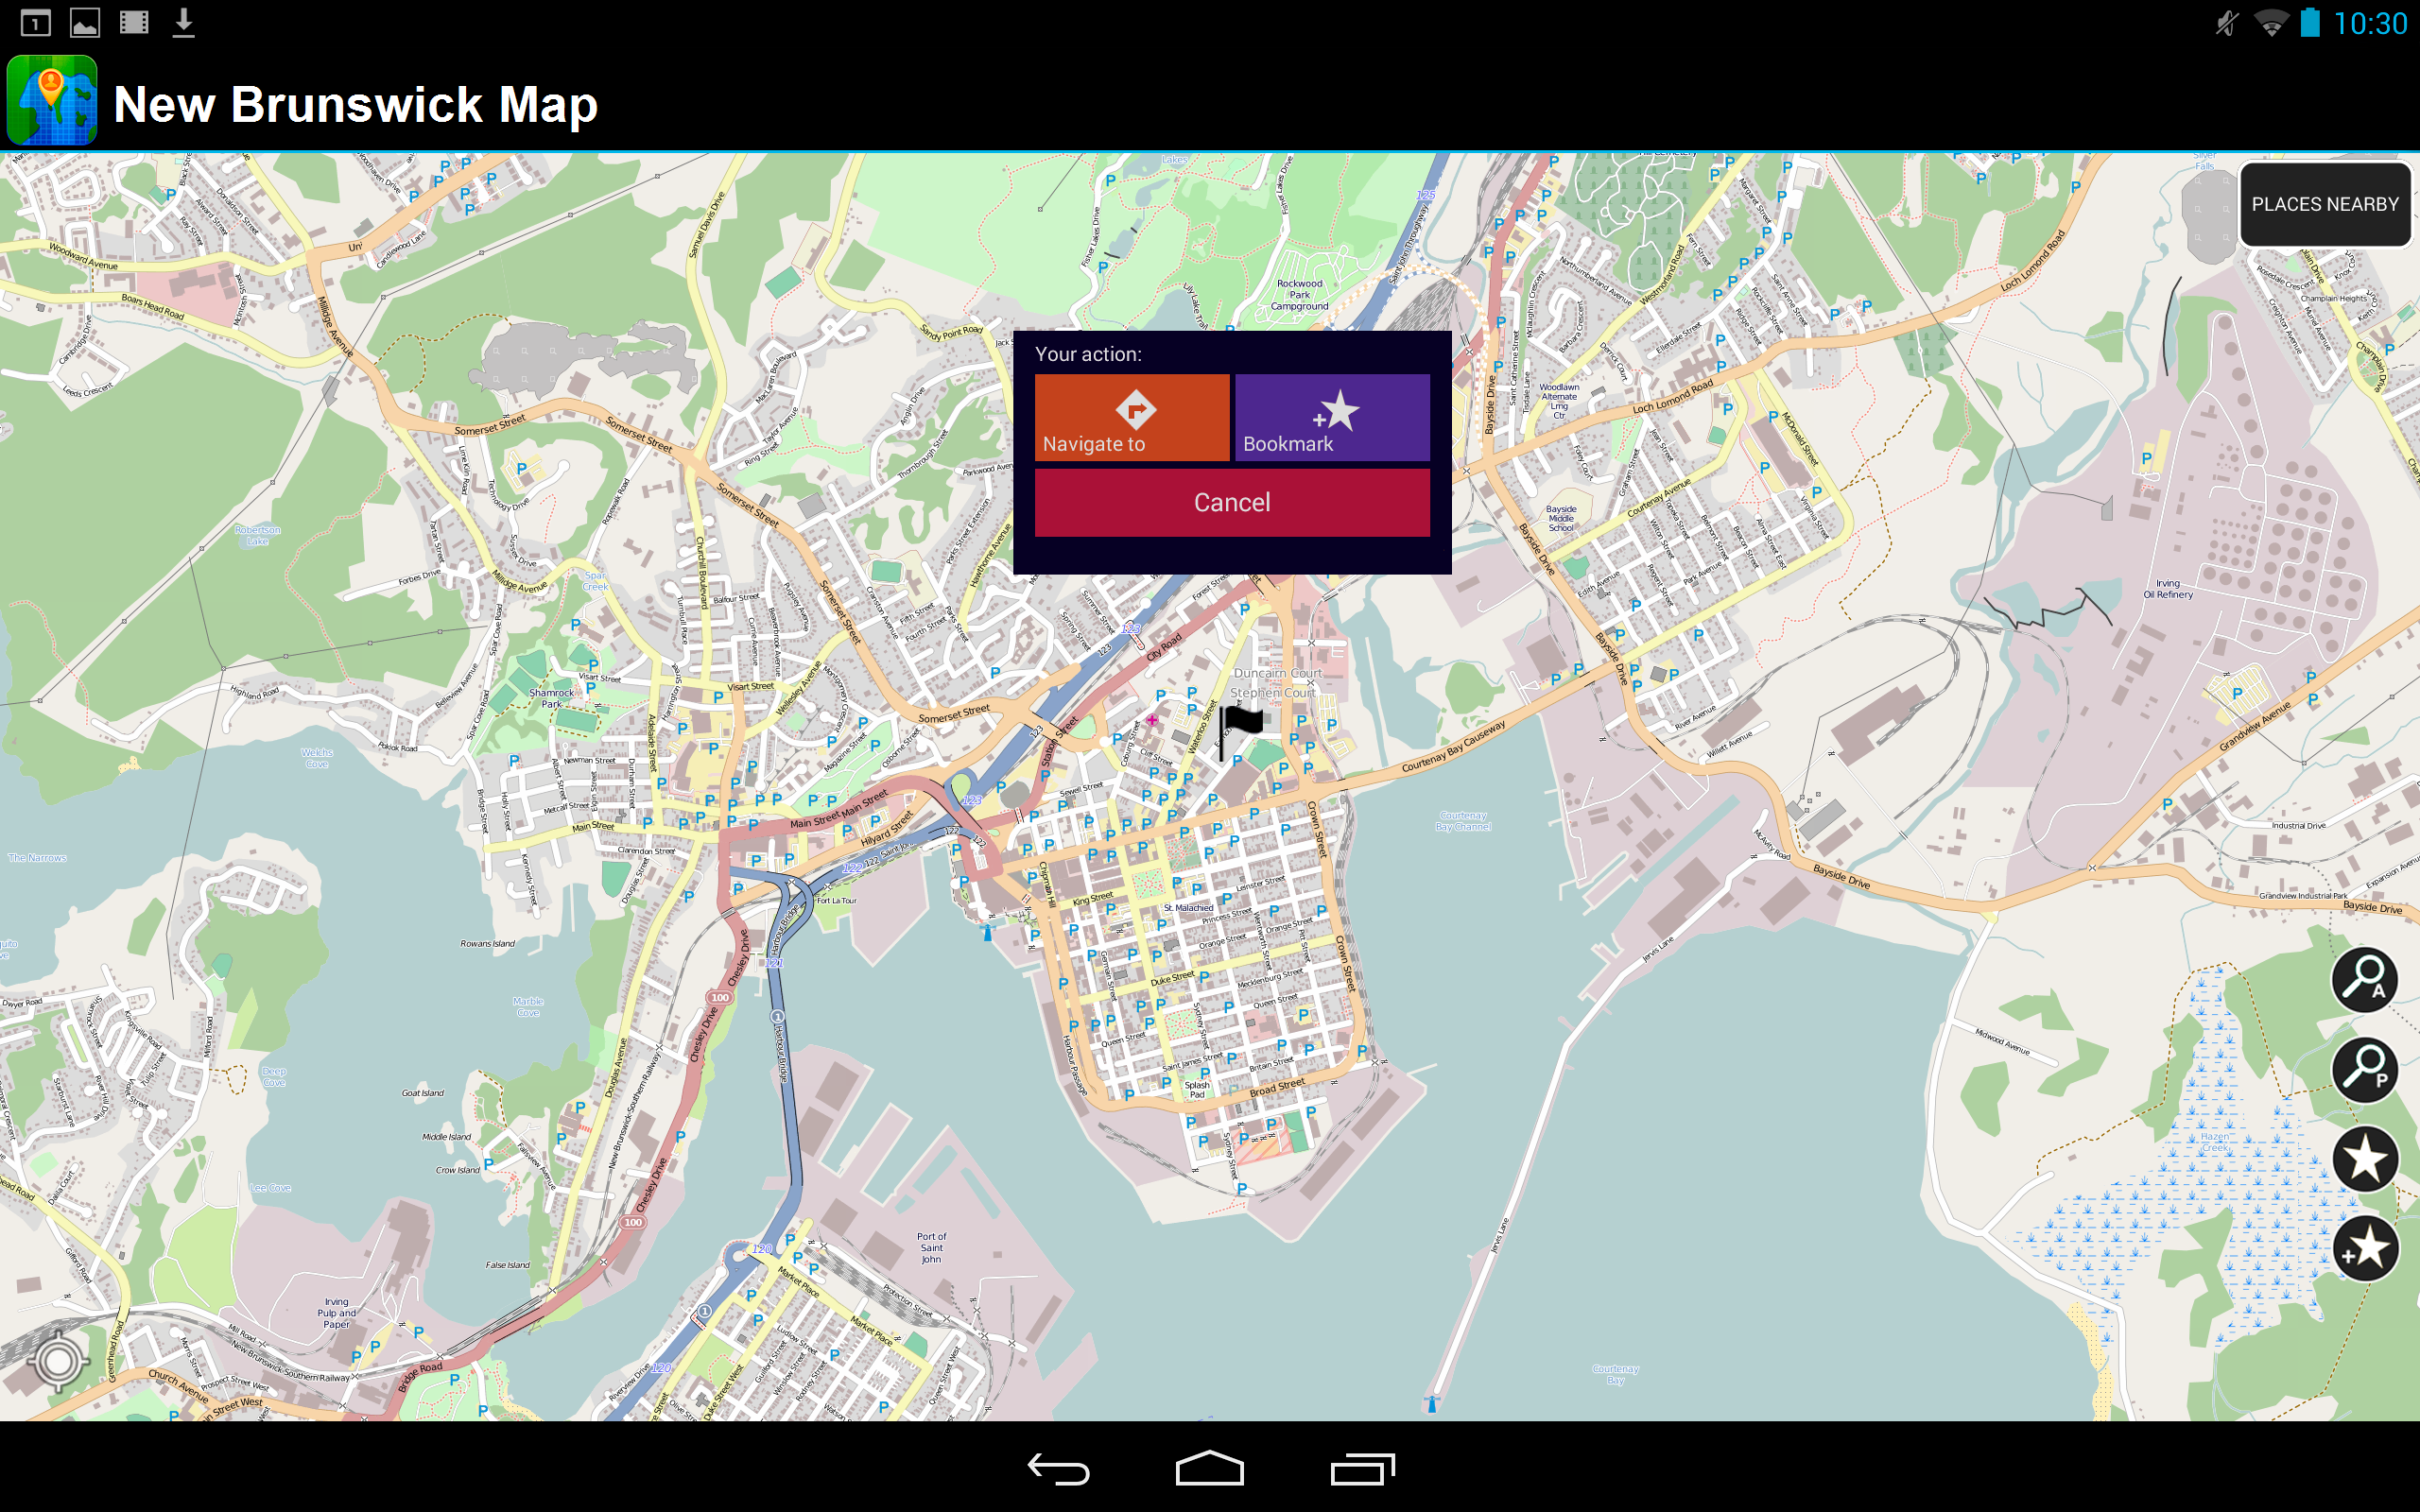 New Brunswick - Offline Karte: Amazon.de: Apps für Android